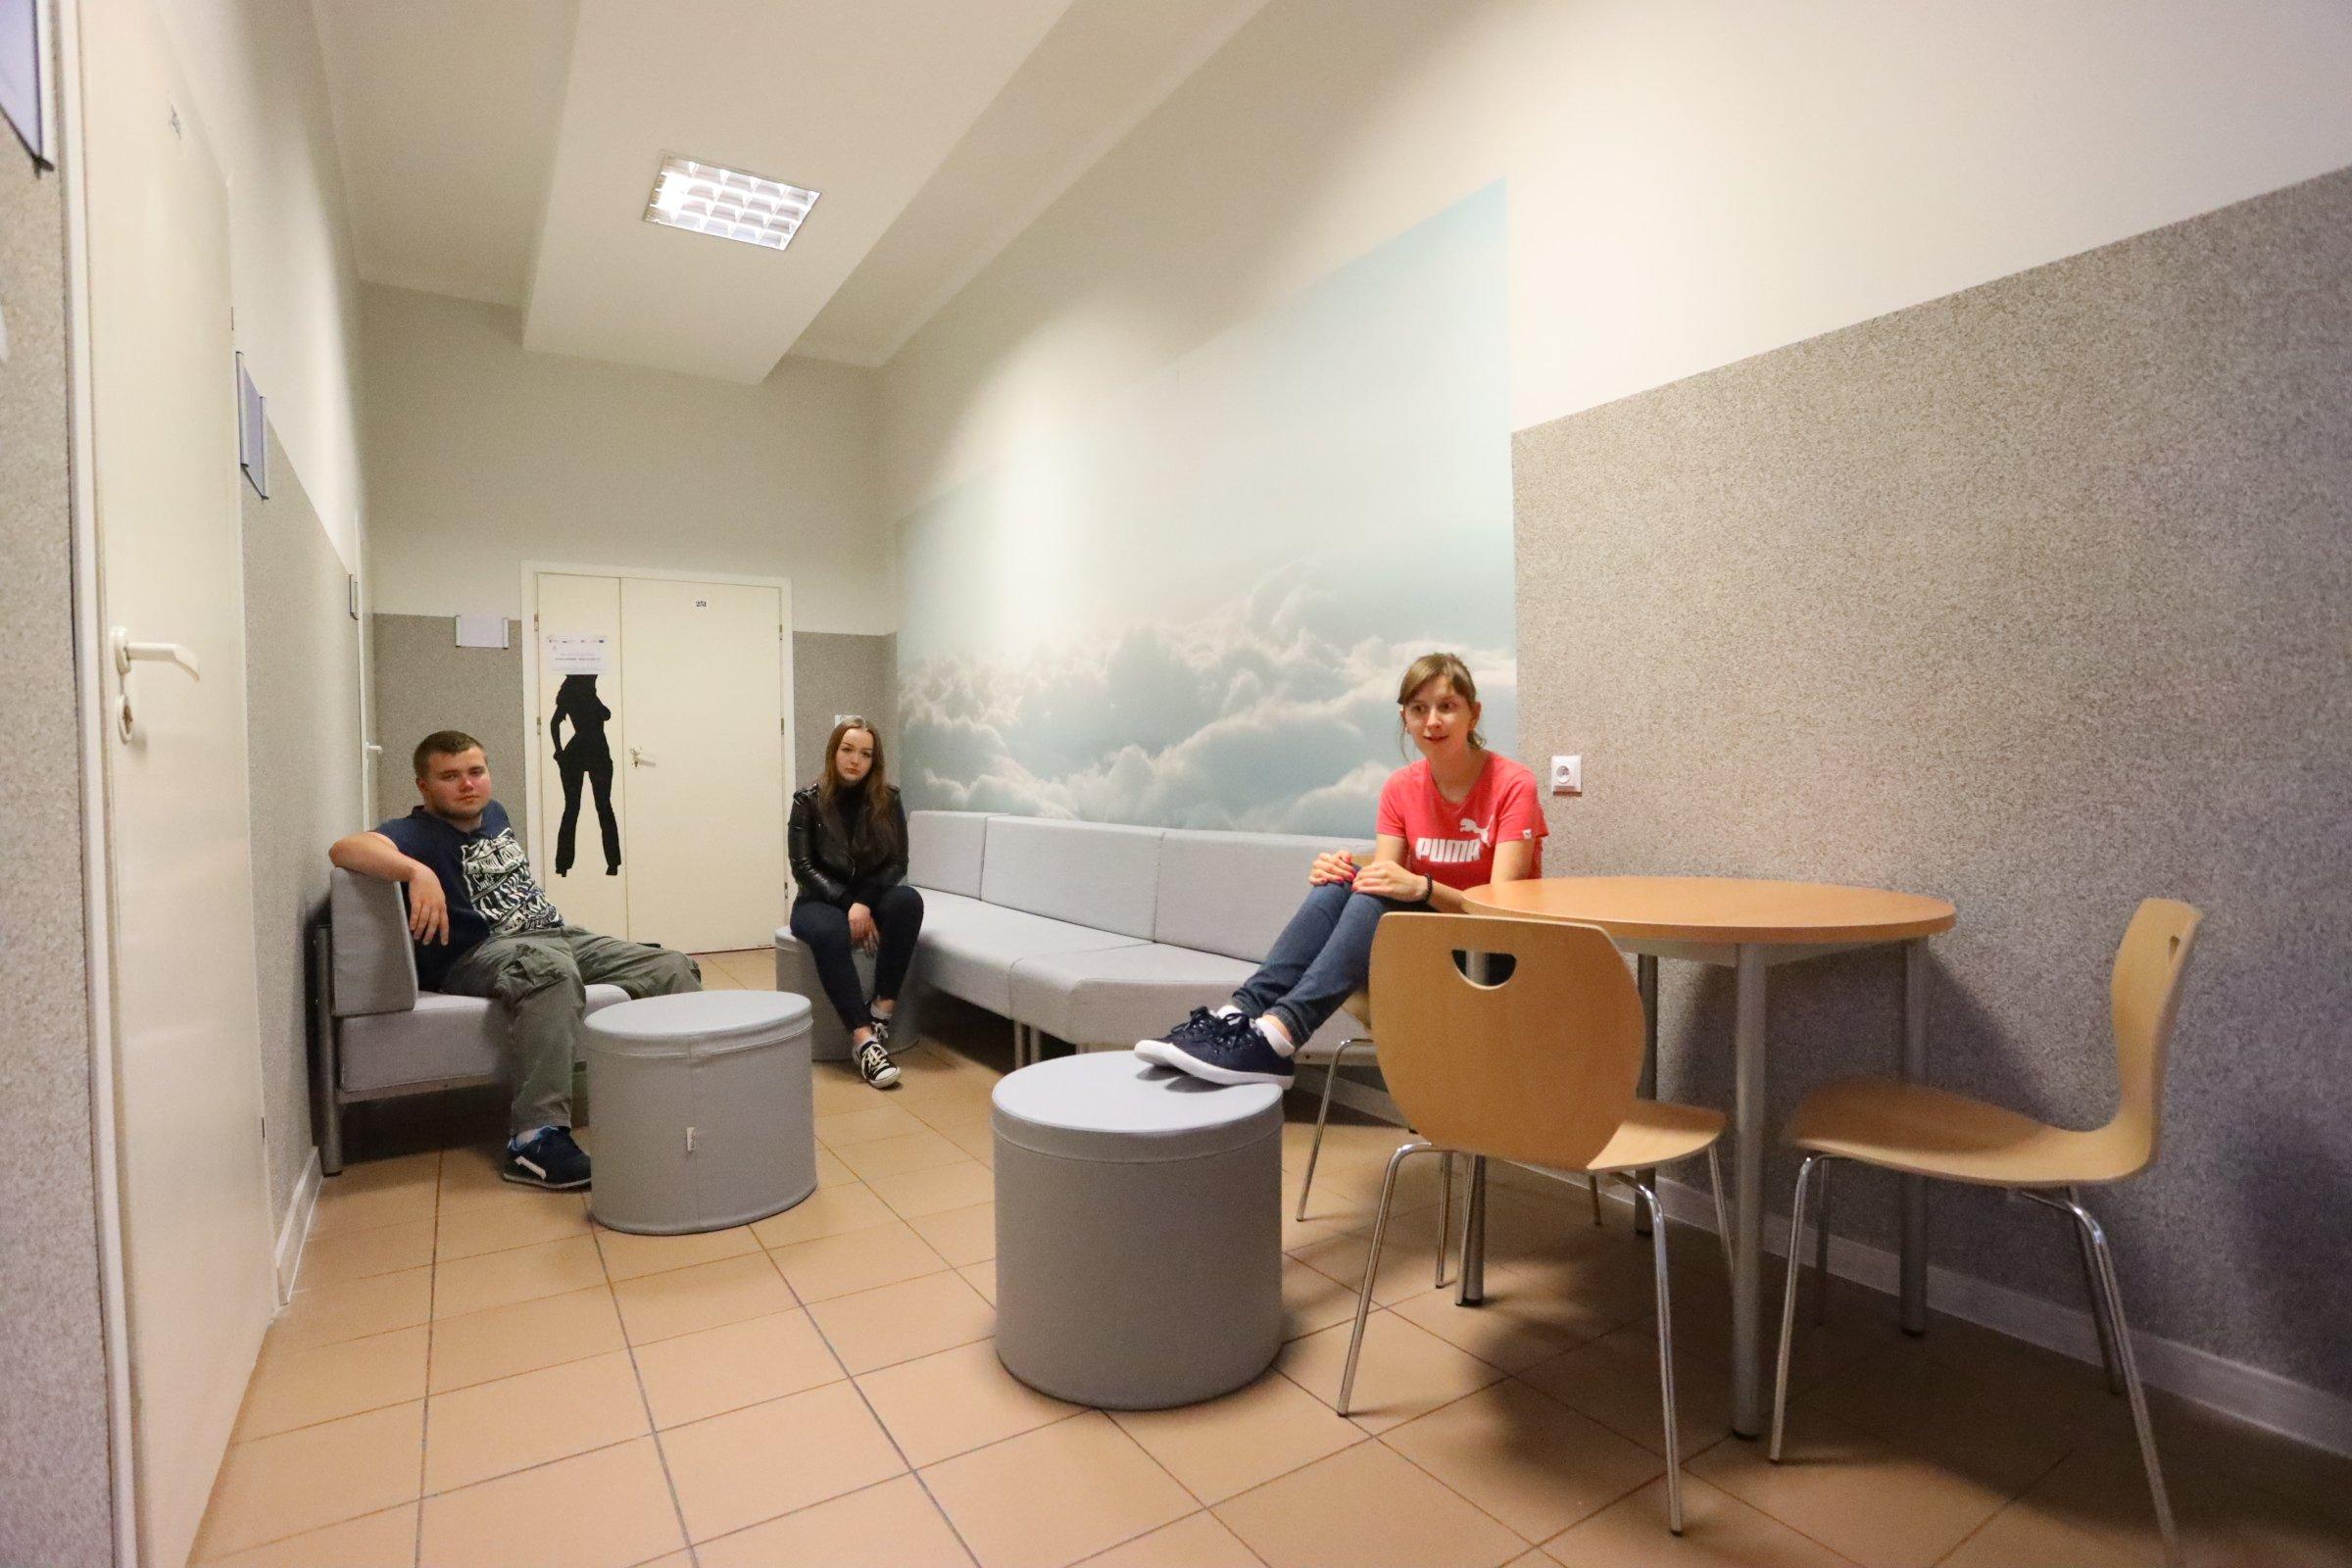 trzy młode osoby siedzą na kanapach, na ścianie tapeta z chmurami